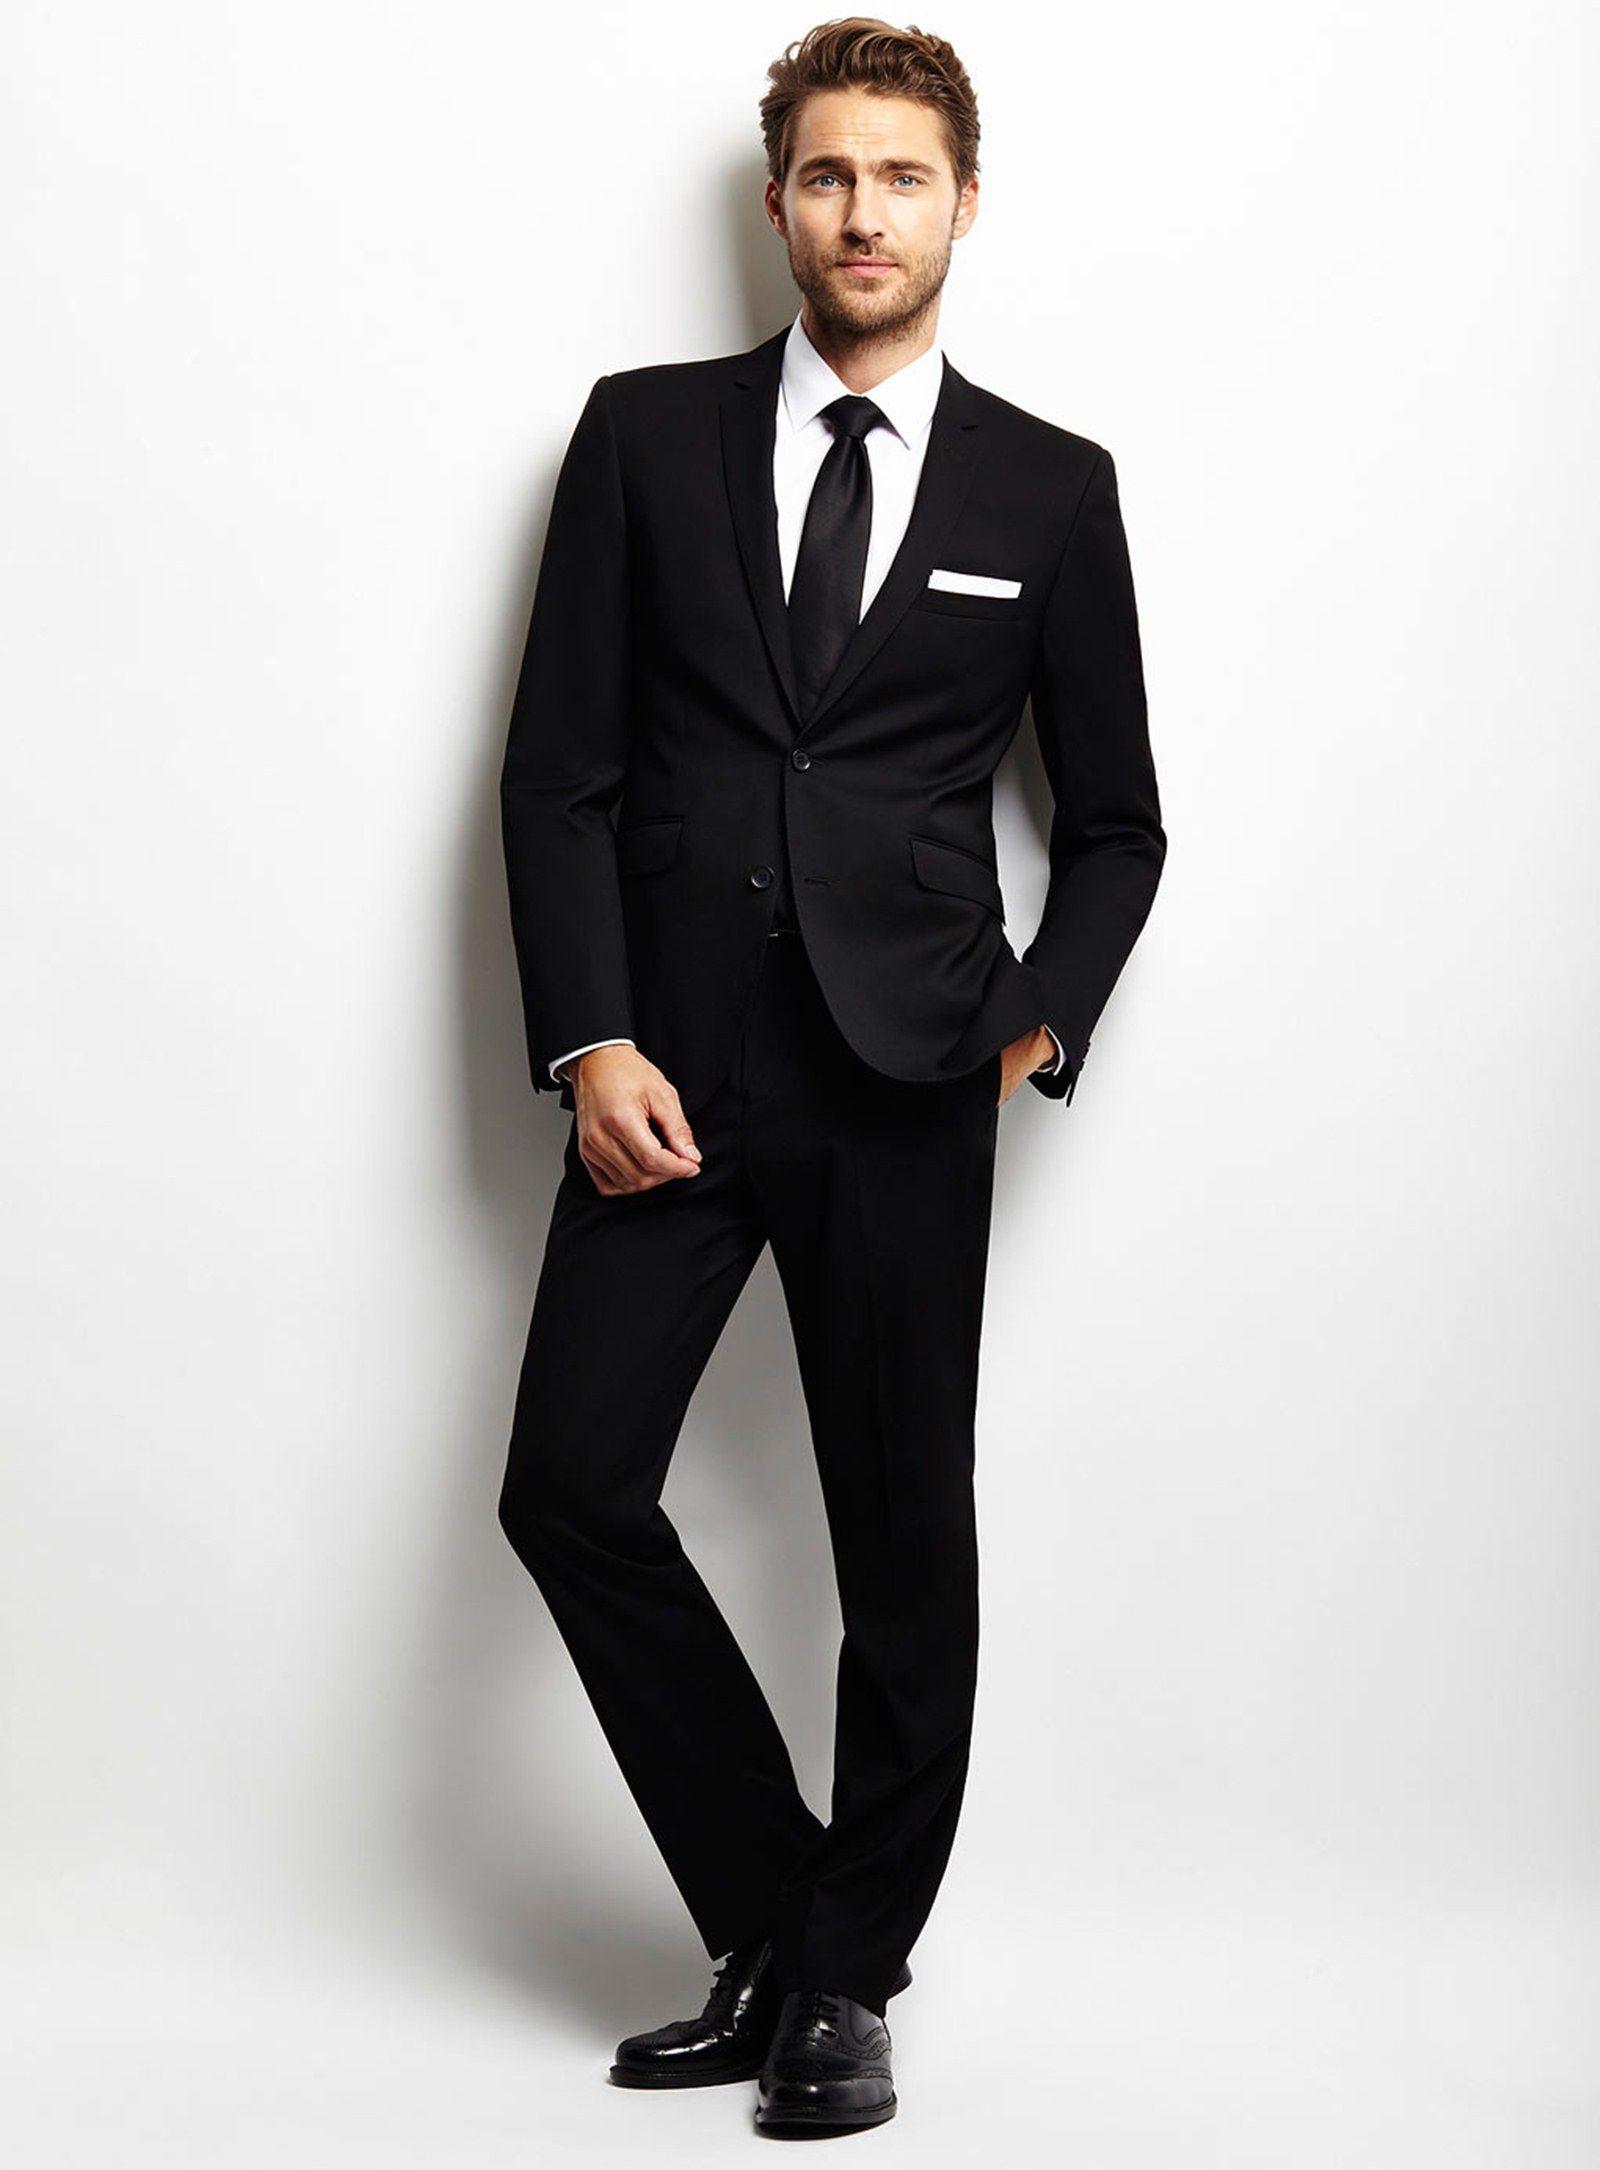 Black Tie Suit Images For The Man